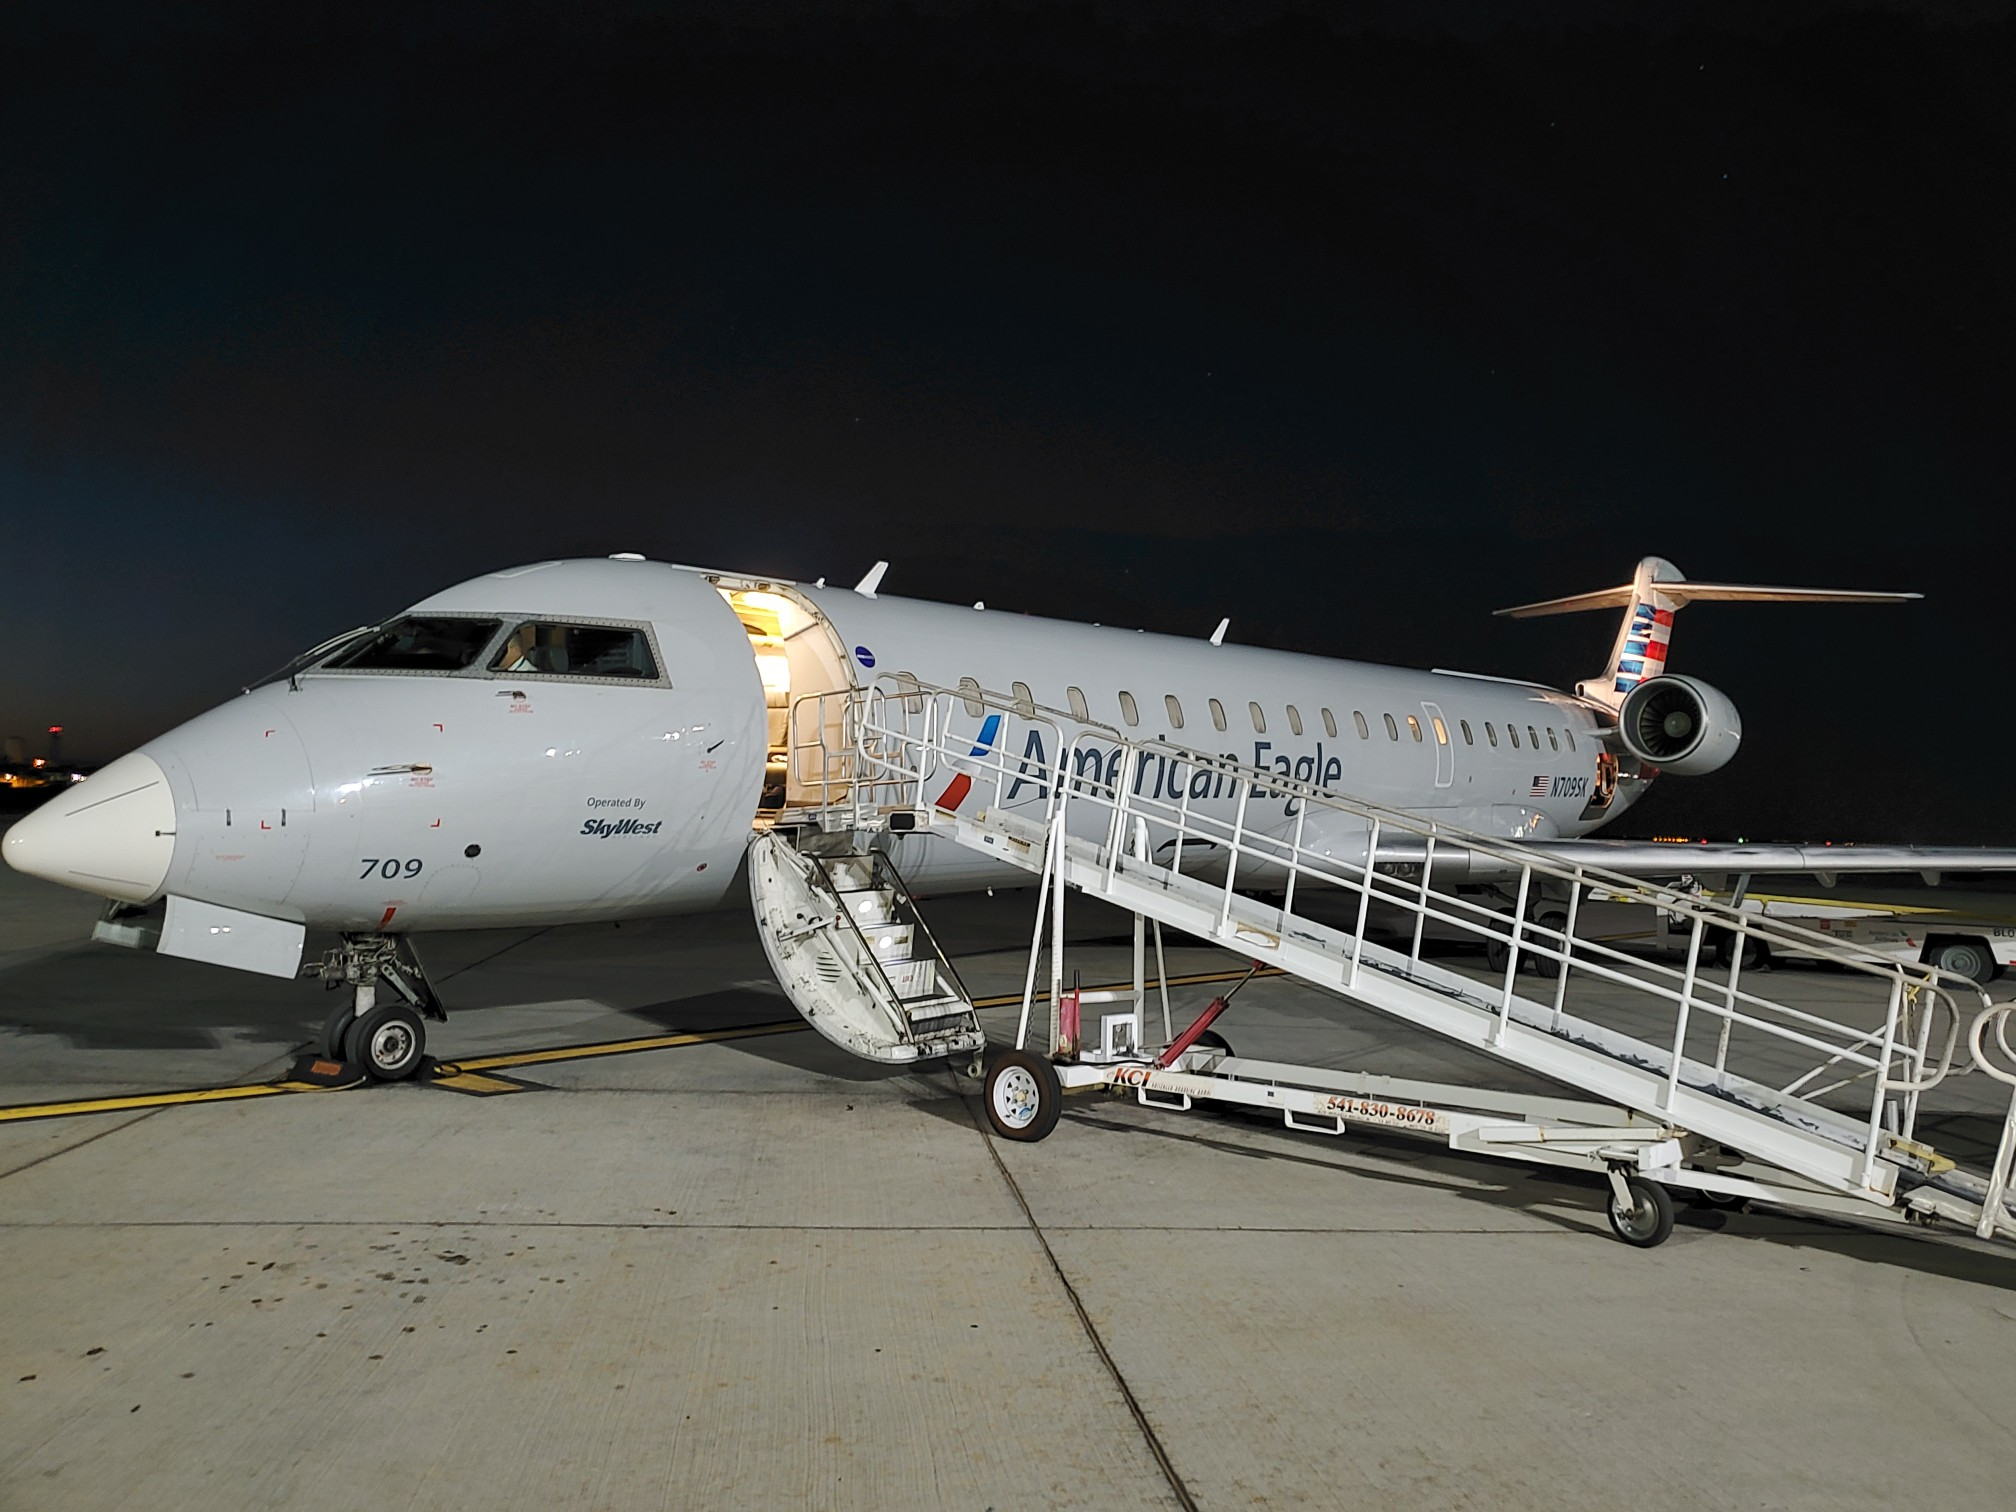 NYL - Yuma MCAS/Yuma International Airport 2191 E 32nd St ...